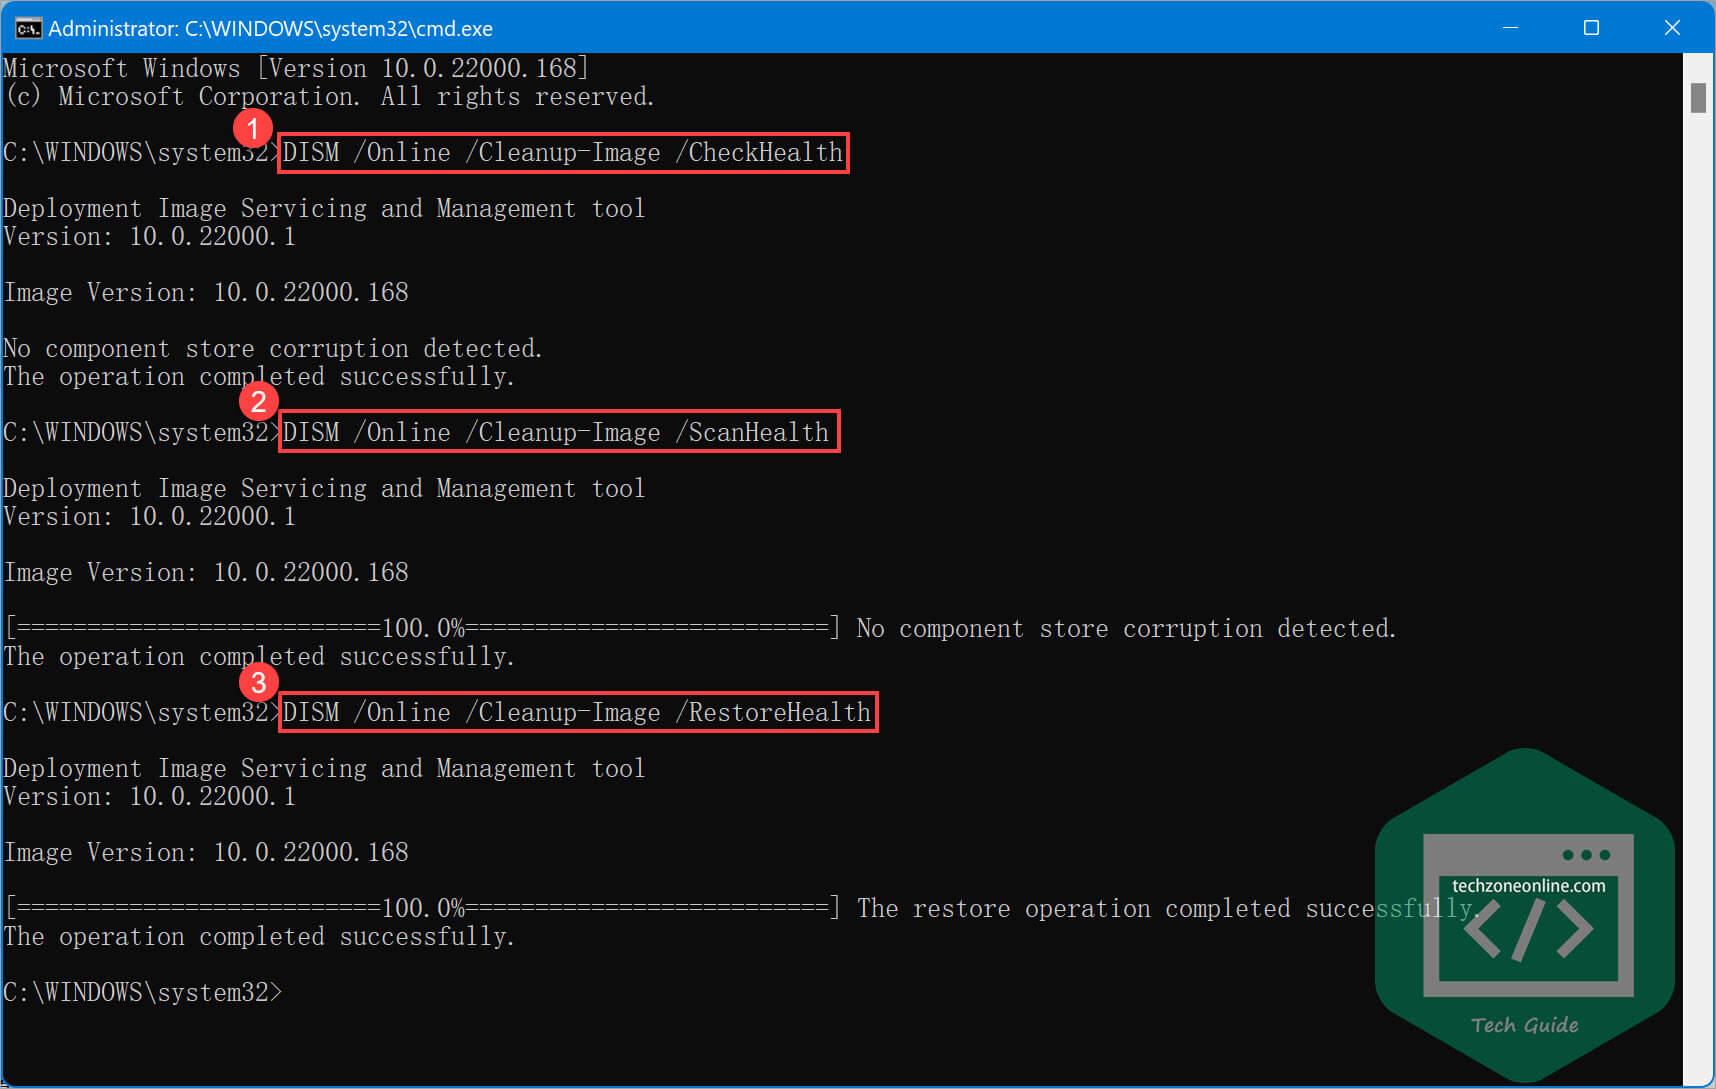 Windows 11 Run DISM command tool